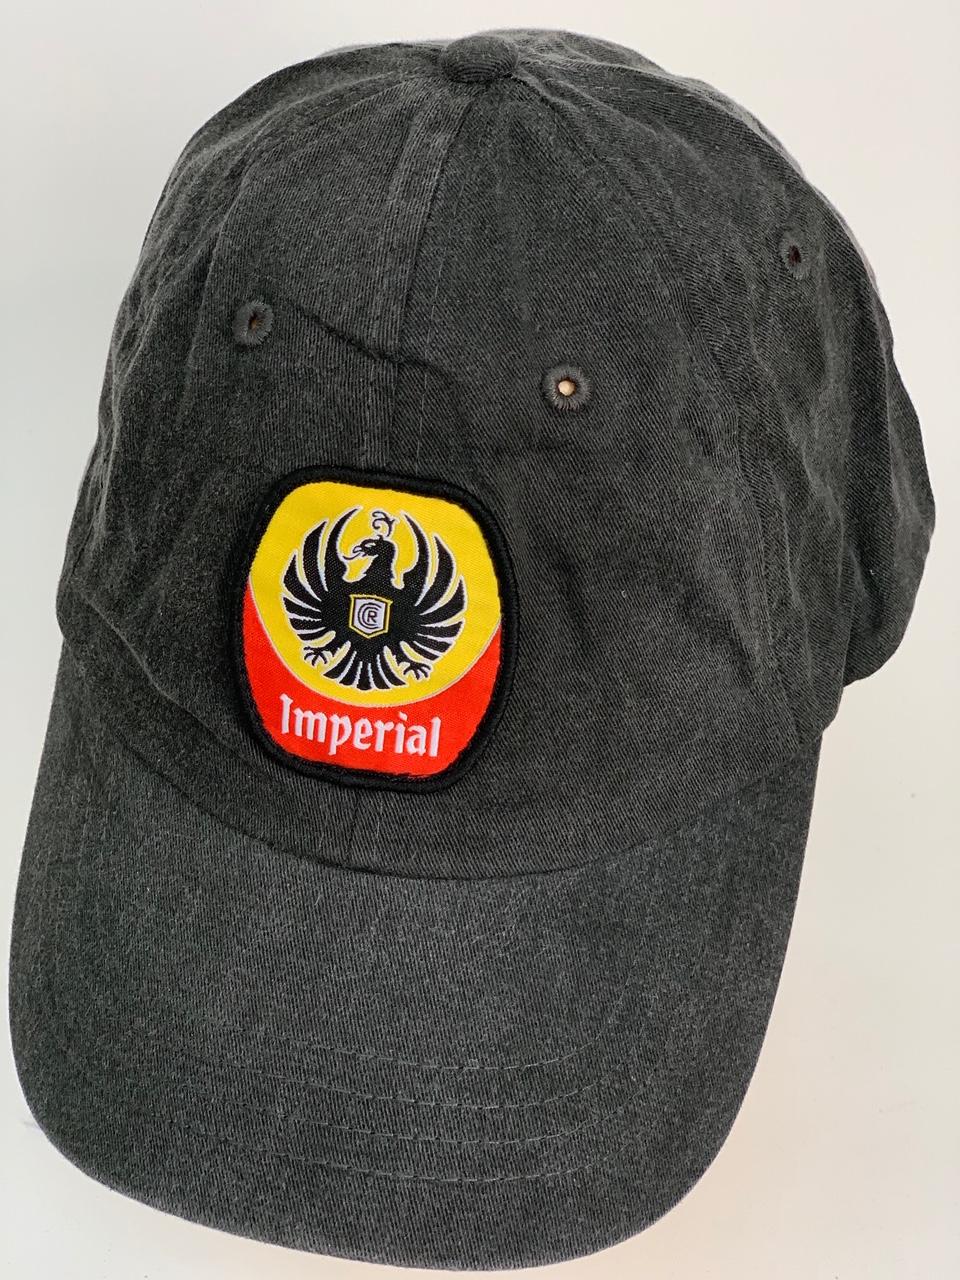 Топовая бейсболка Imperial